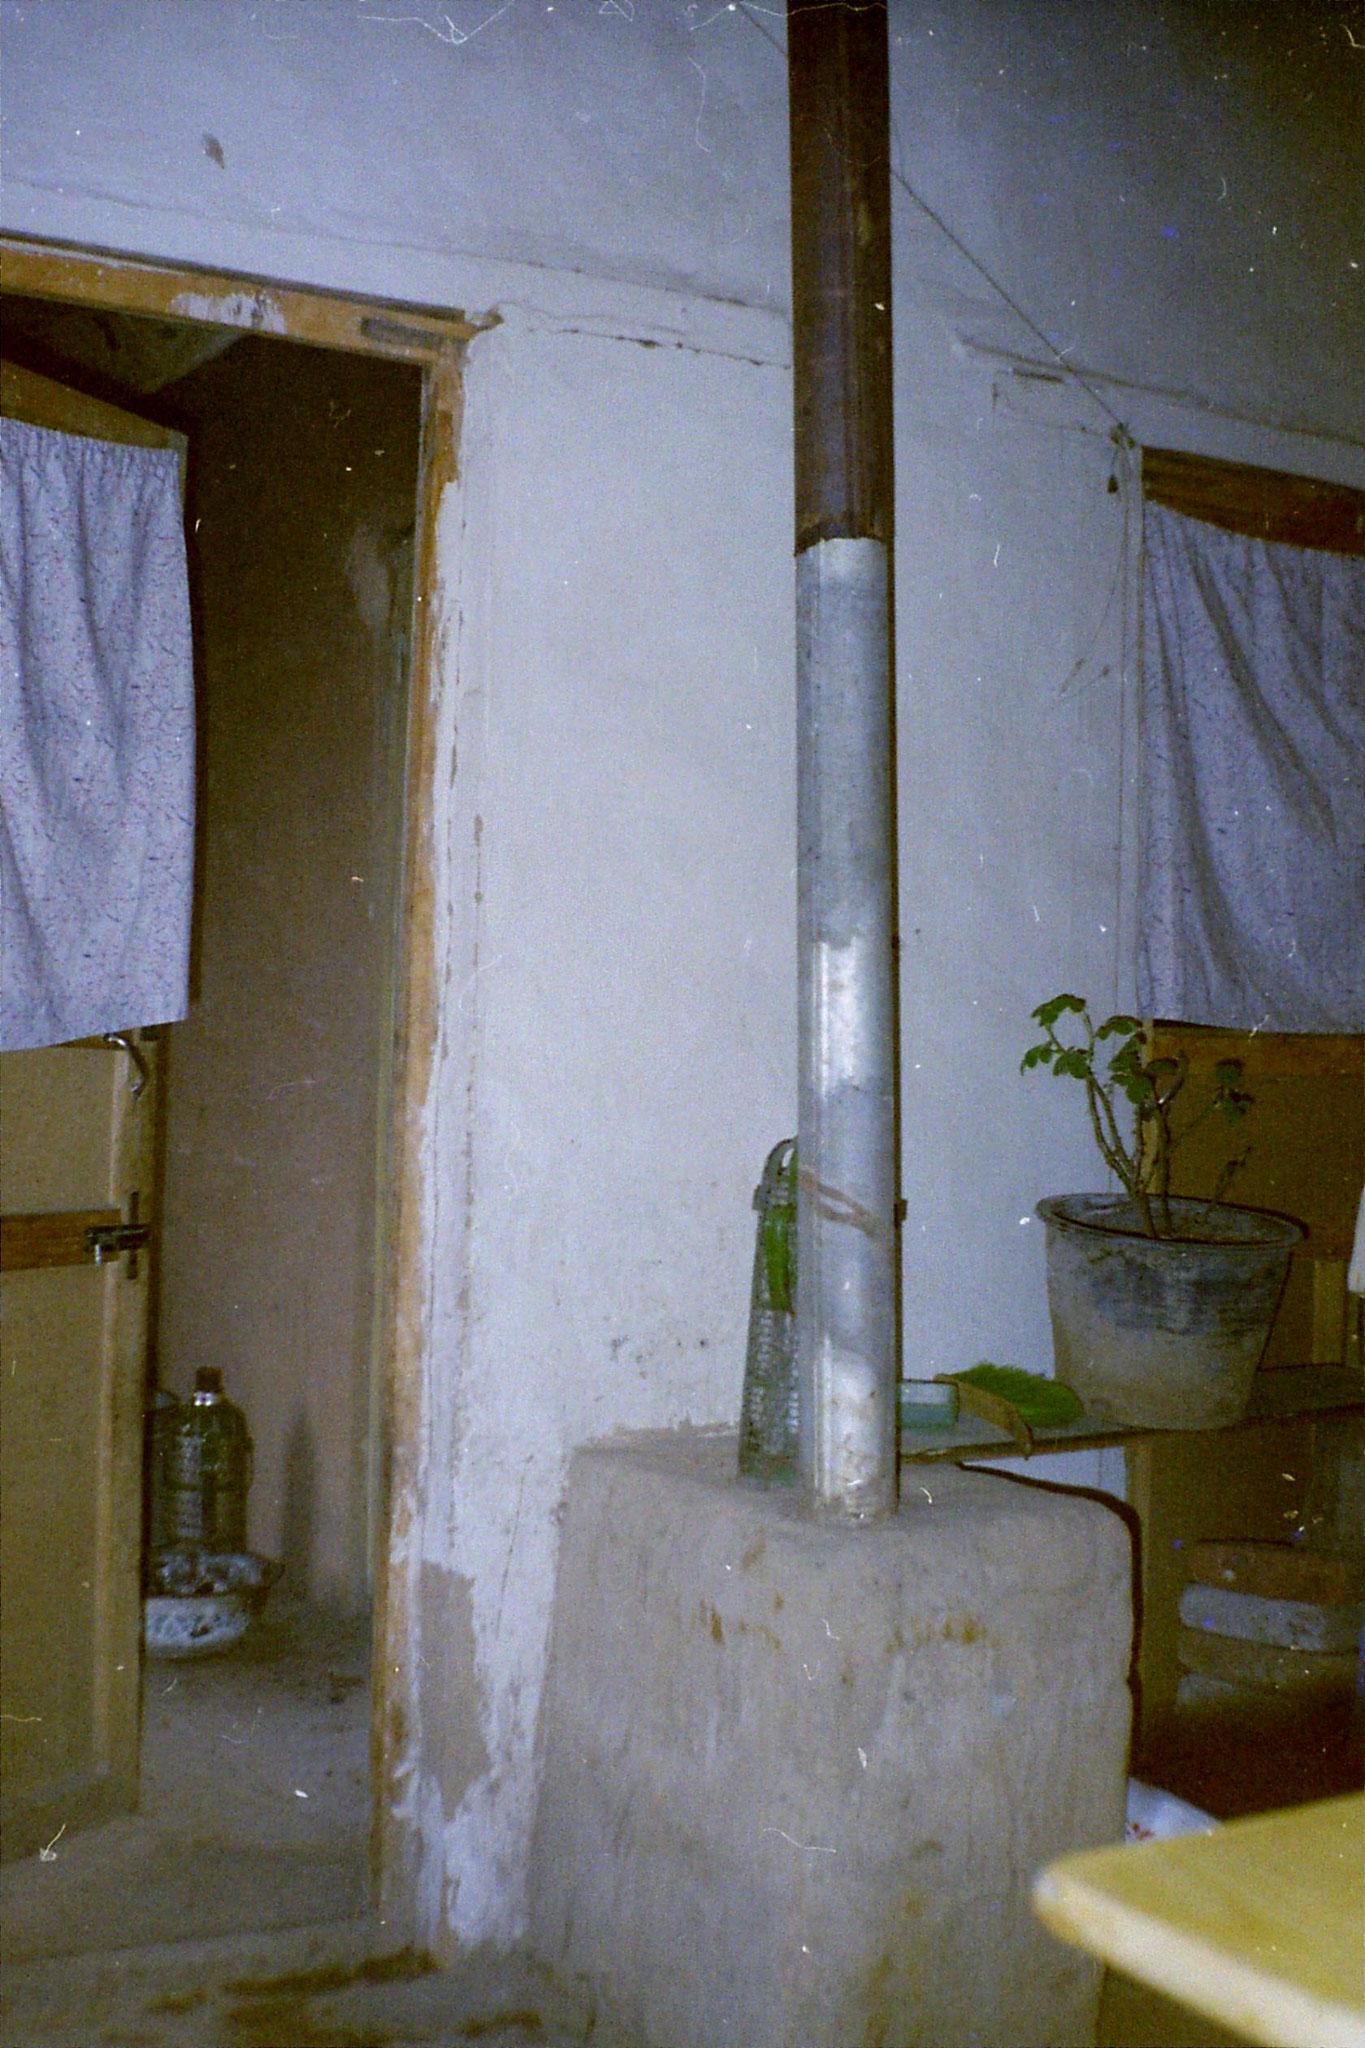 15/2/1989: 20: Liu Bo's house